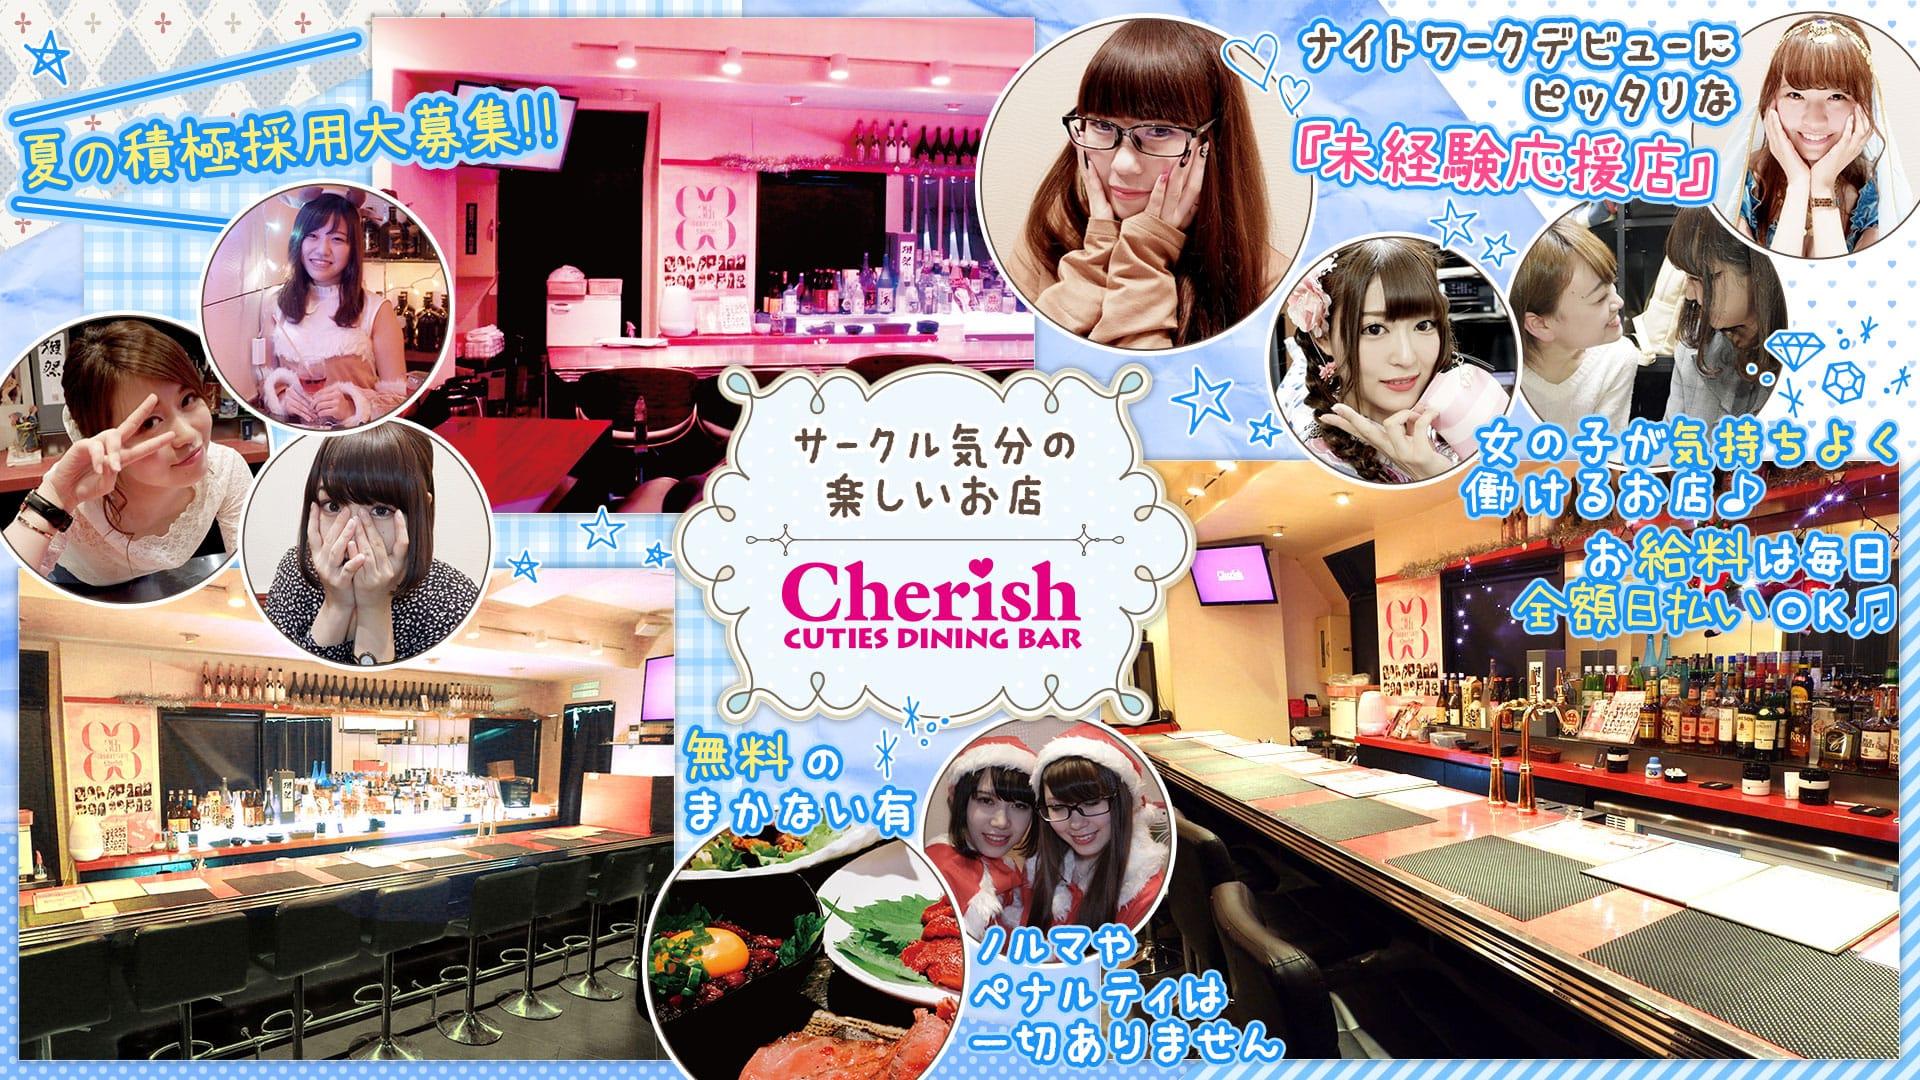 CUTIES DINING BAR Cherish<チェリッシュ2号店> 池袋 ガールズバー TOP画像